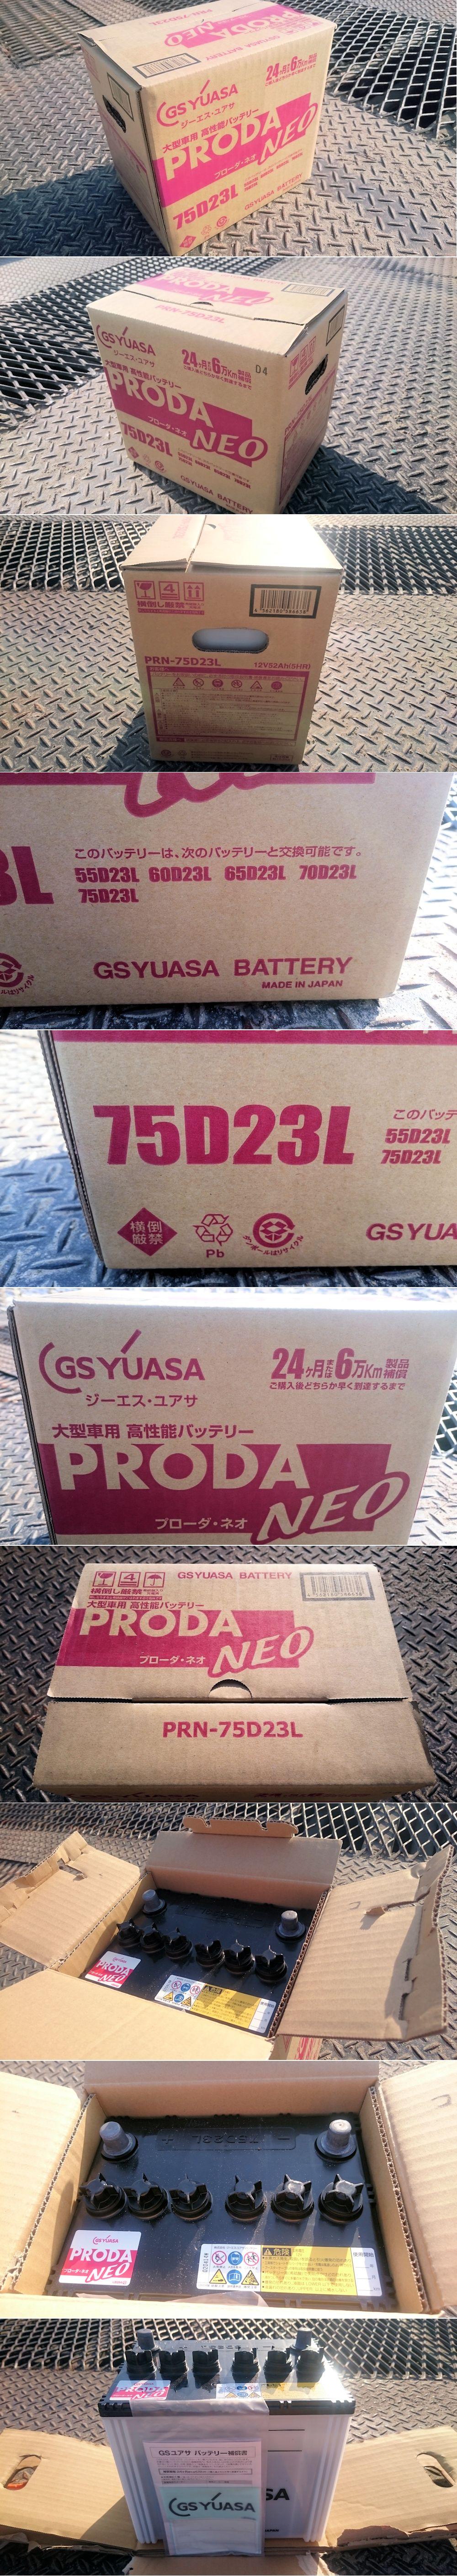 GSユアサ PRODA NEOシリーズ バッテリー